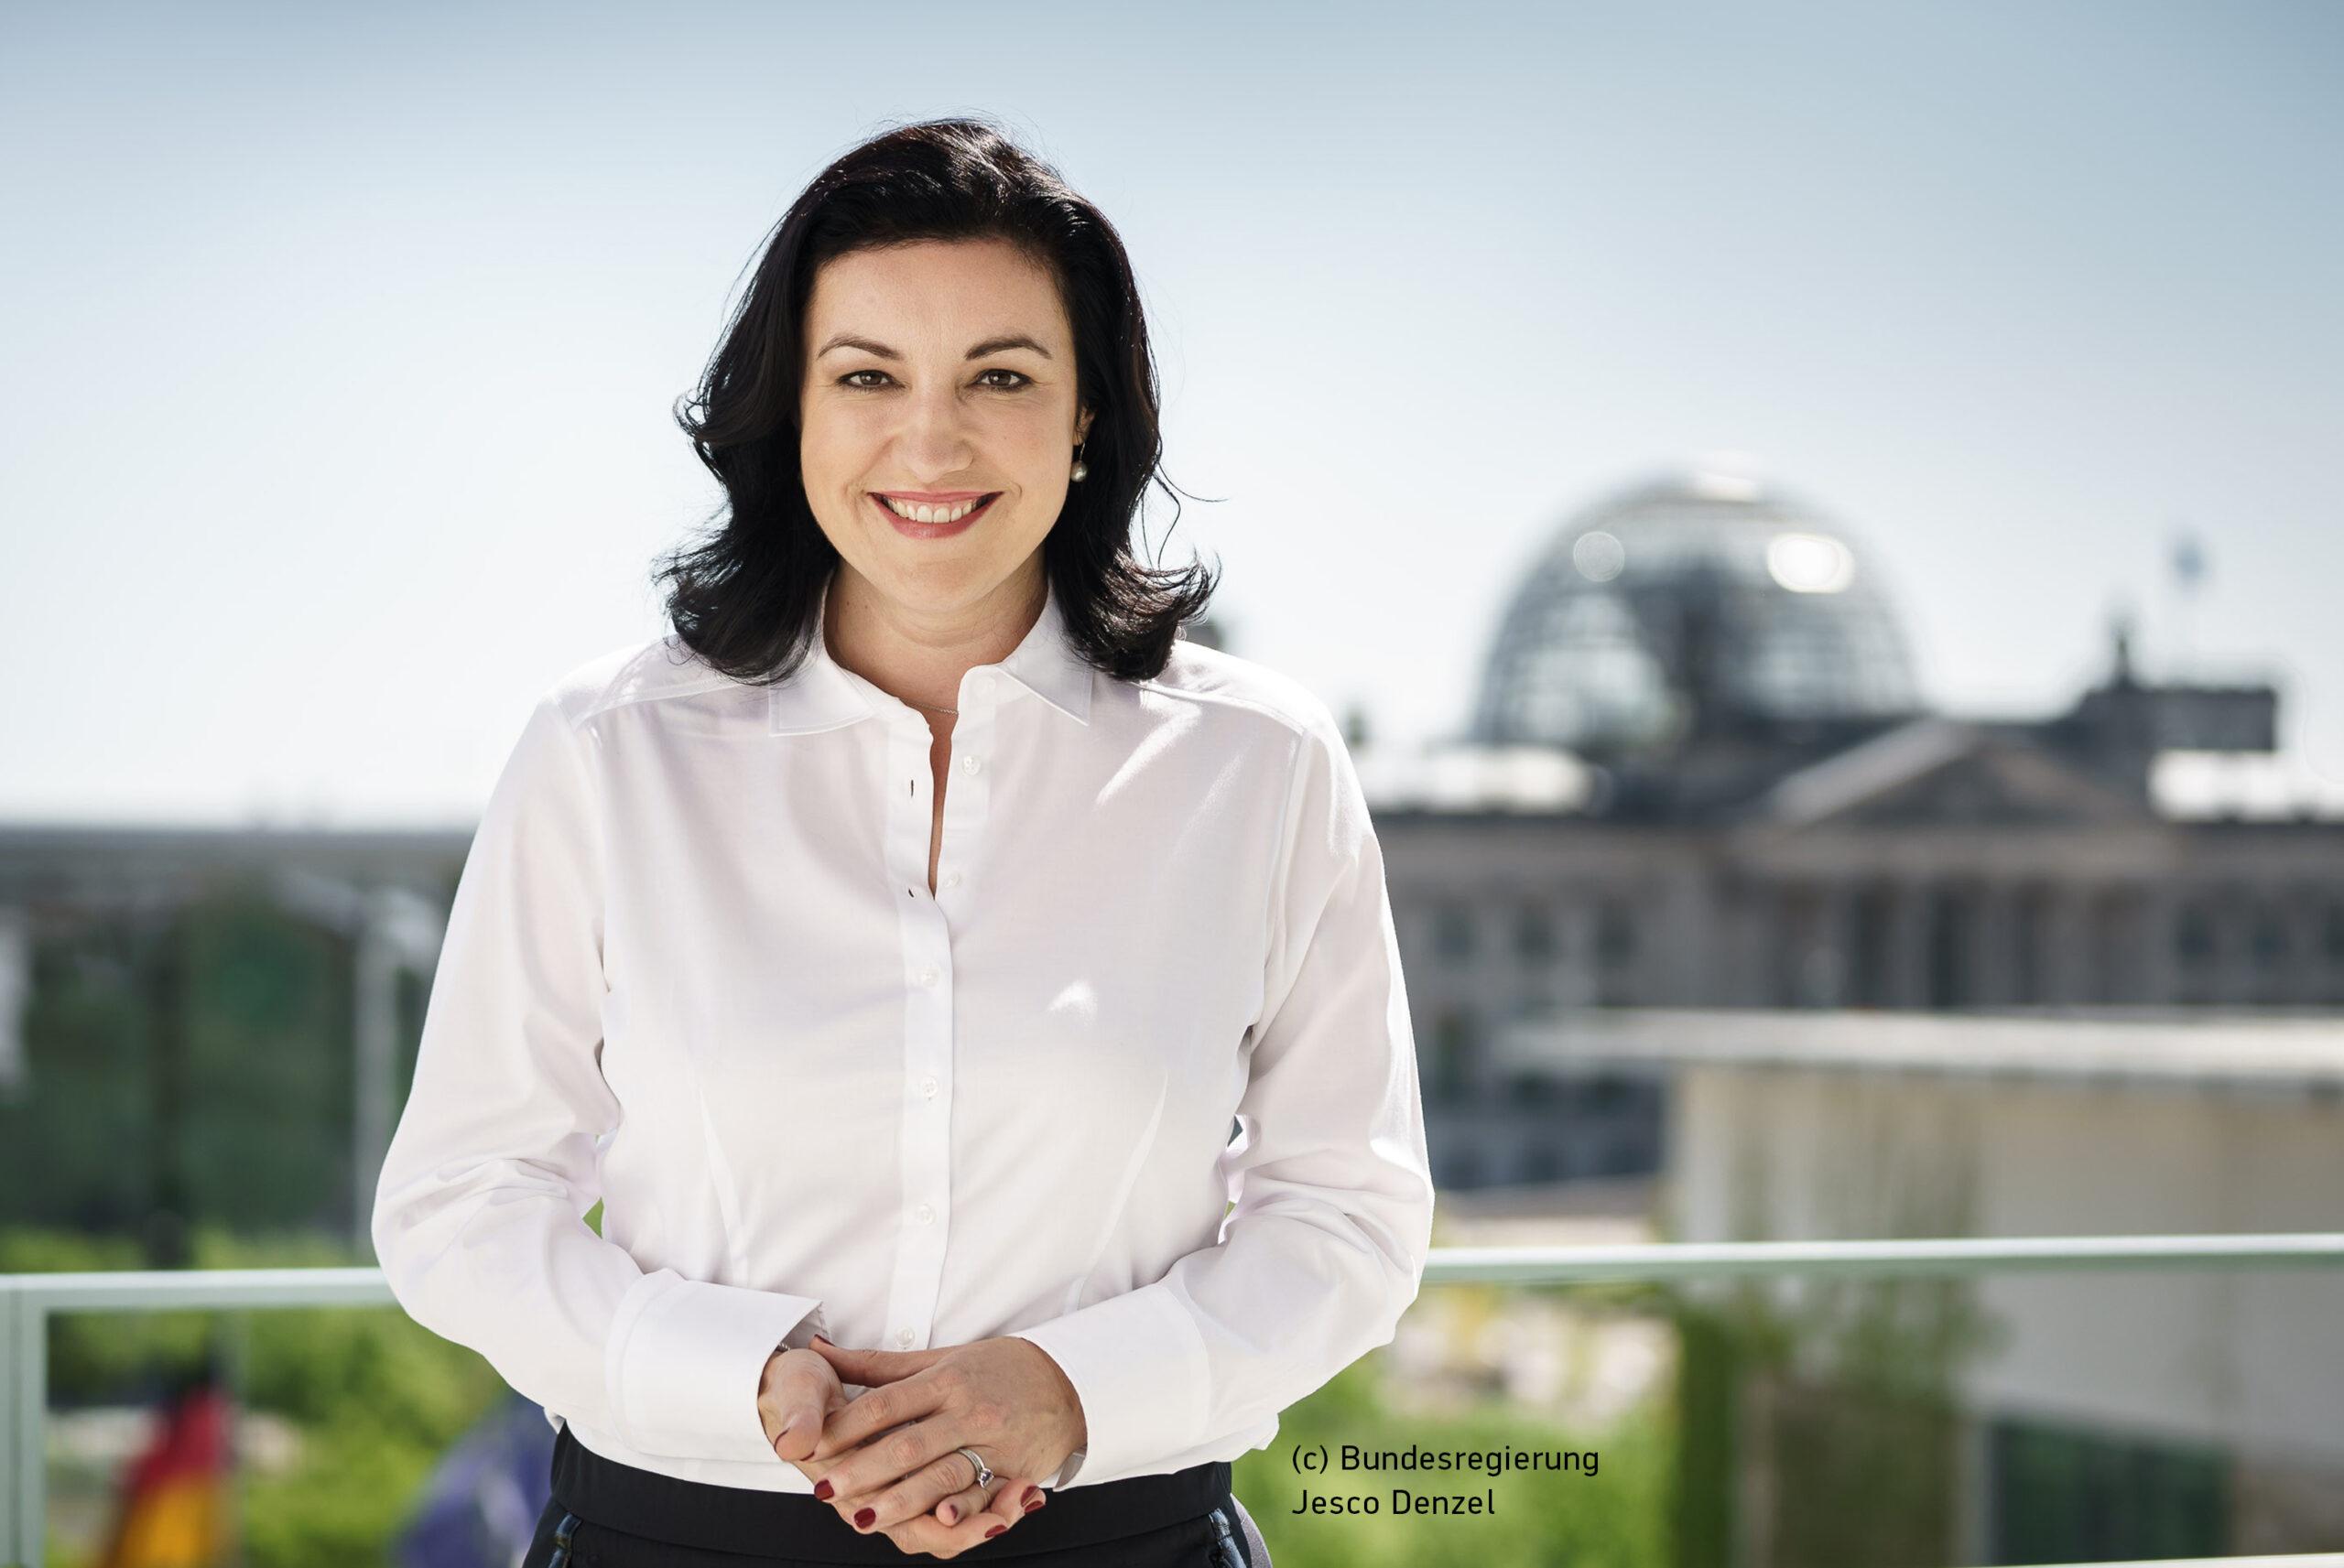 Dorothee Bär - Foto Bundesregierung Jesco Denzel